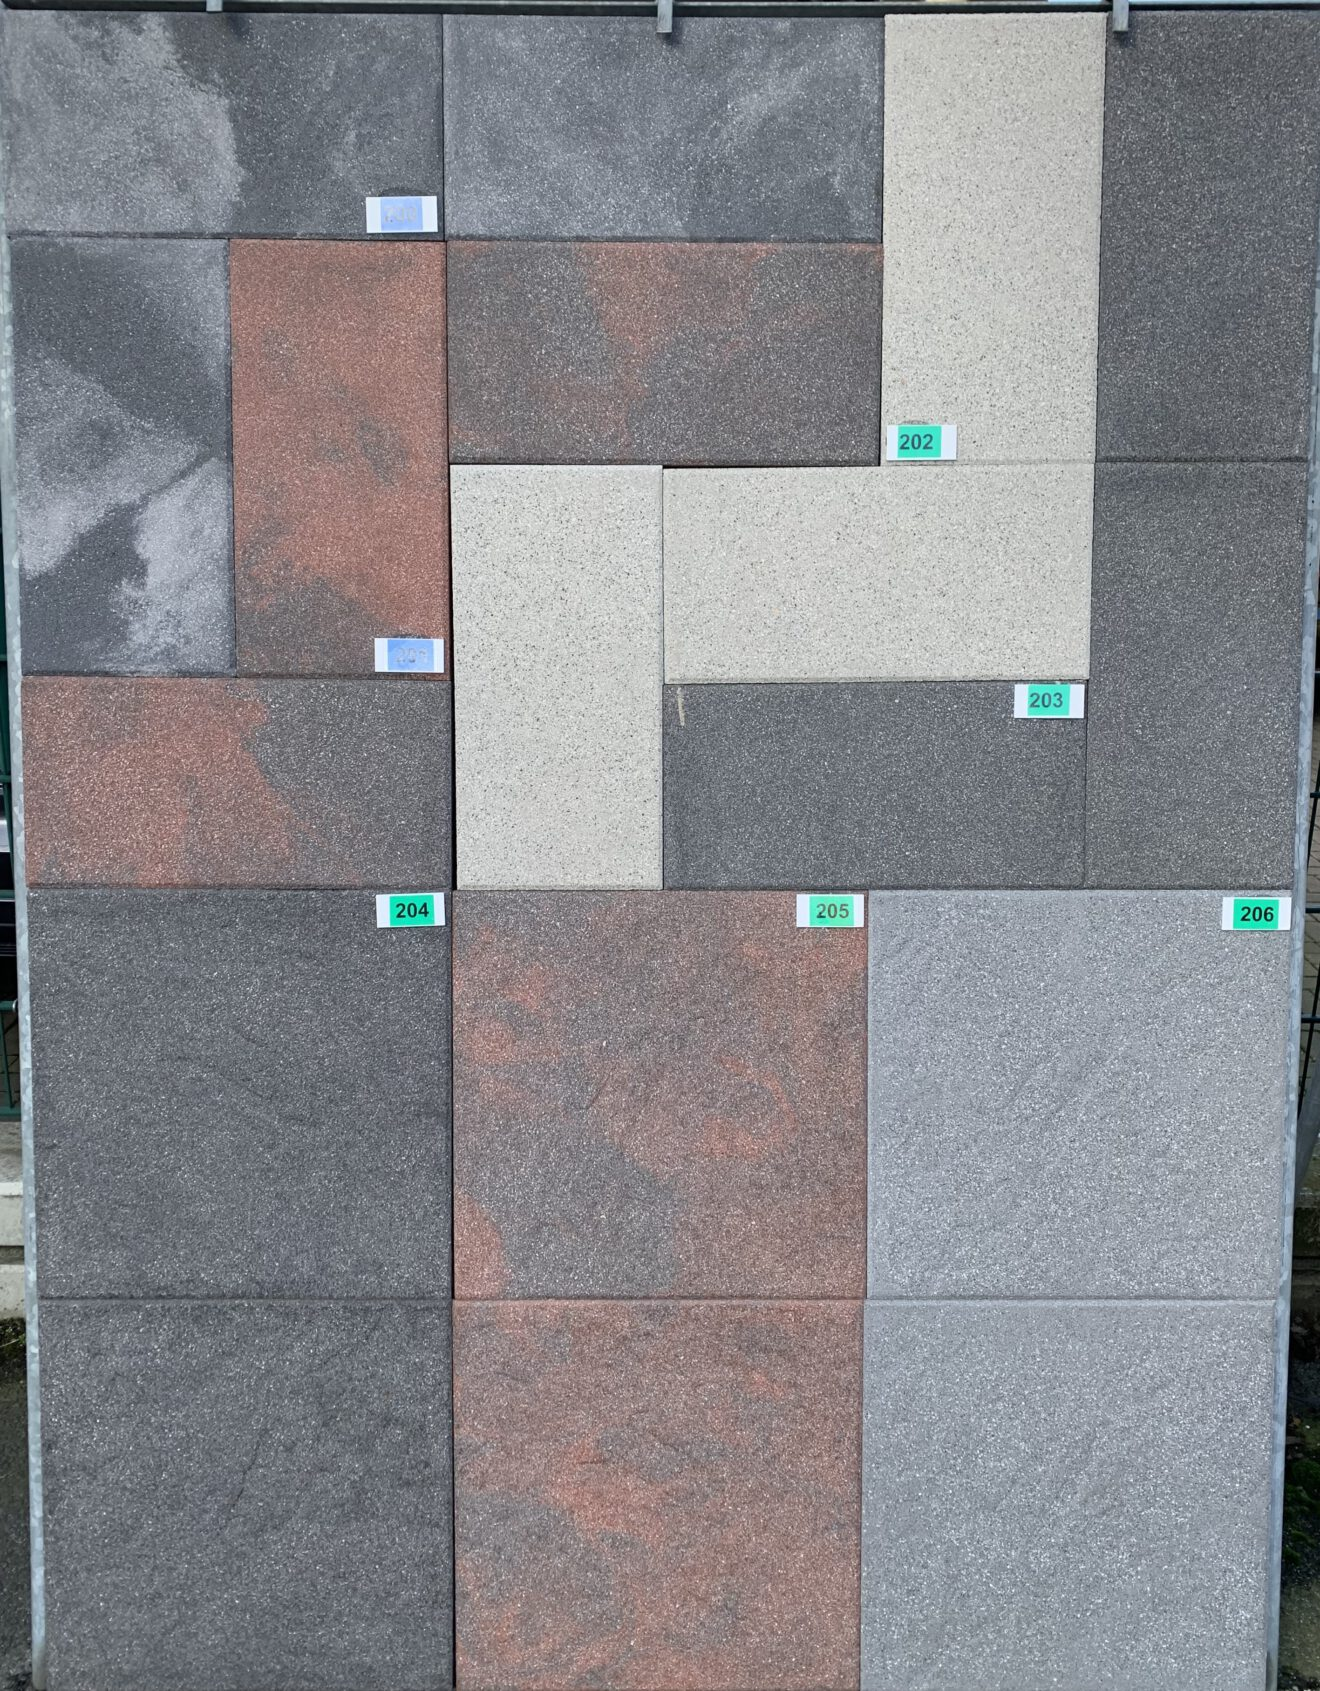 Gartenplatten Novalux anthrazit bei Stolzenbach Baustoffe in Bremen kaufen